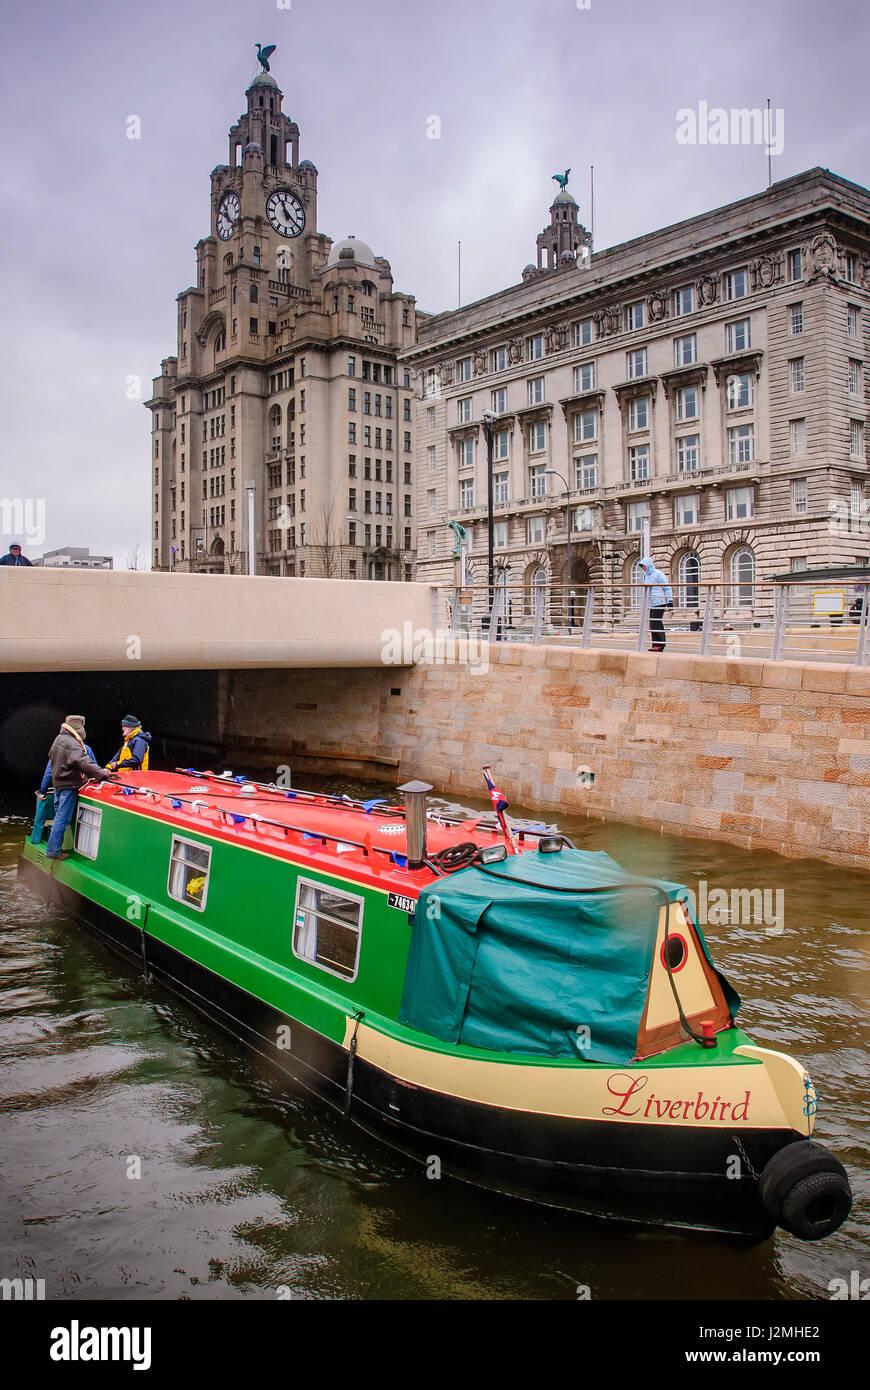 Liverbird narrowboat Liverpool pierhead - Stock Image